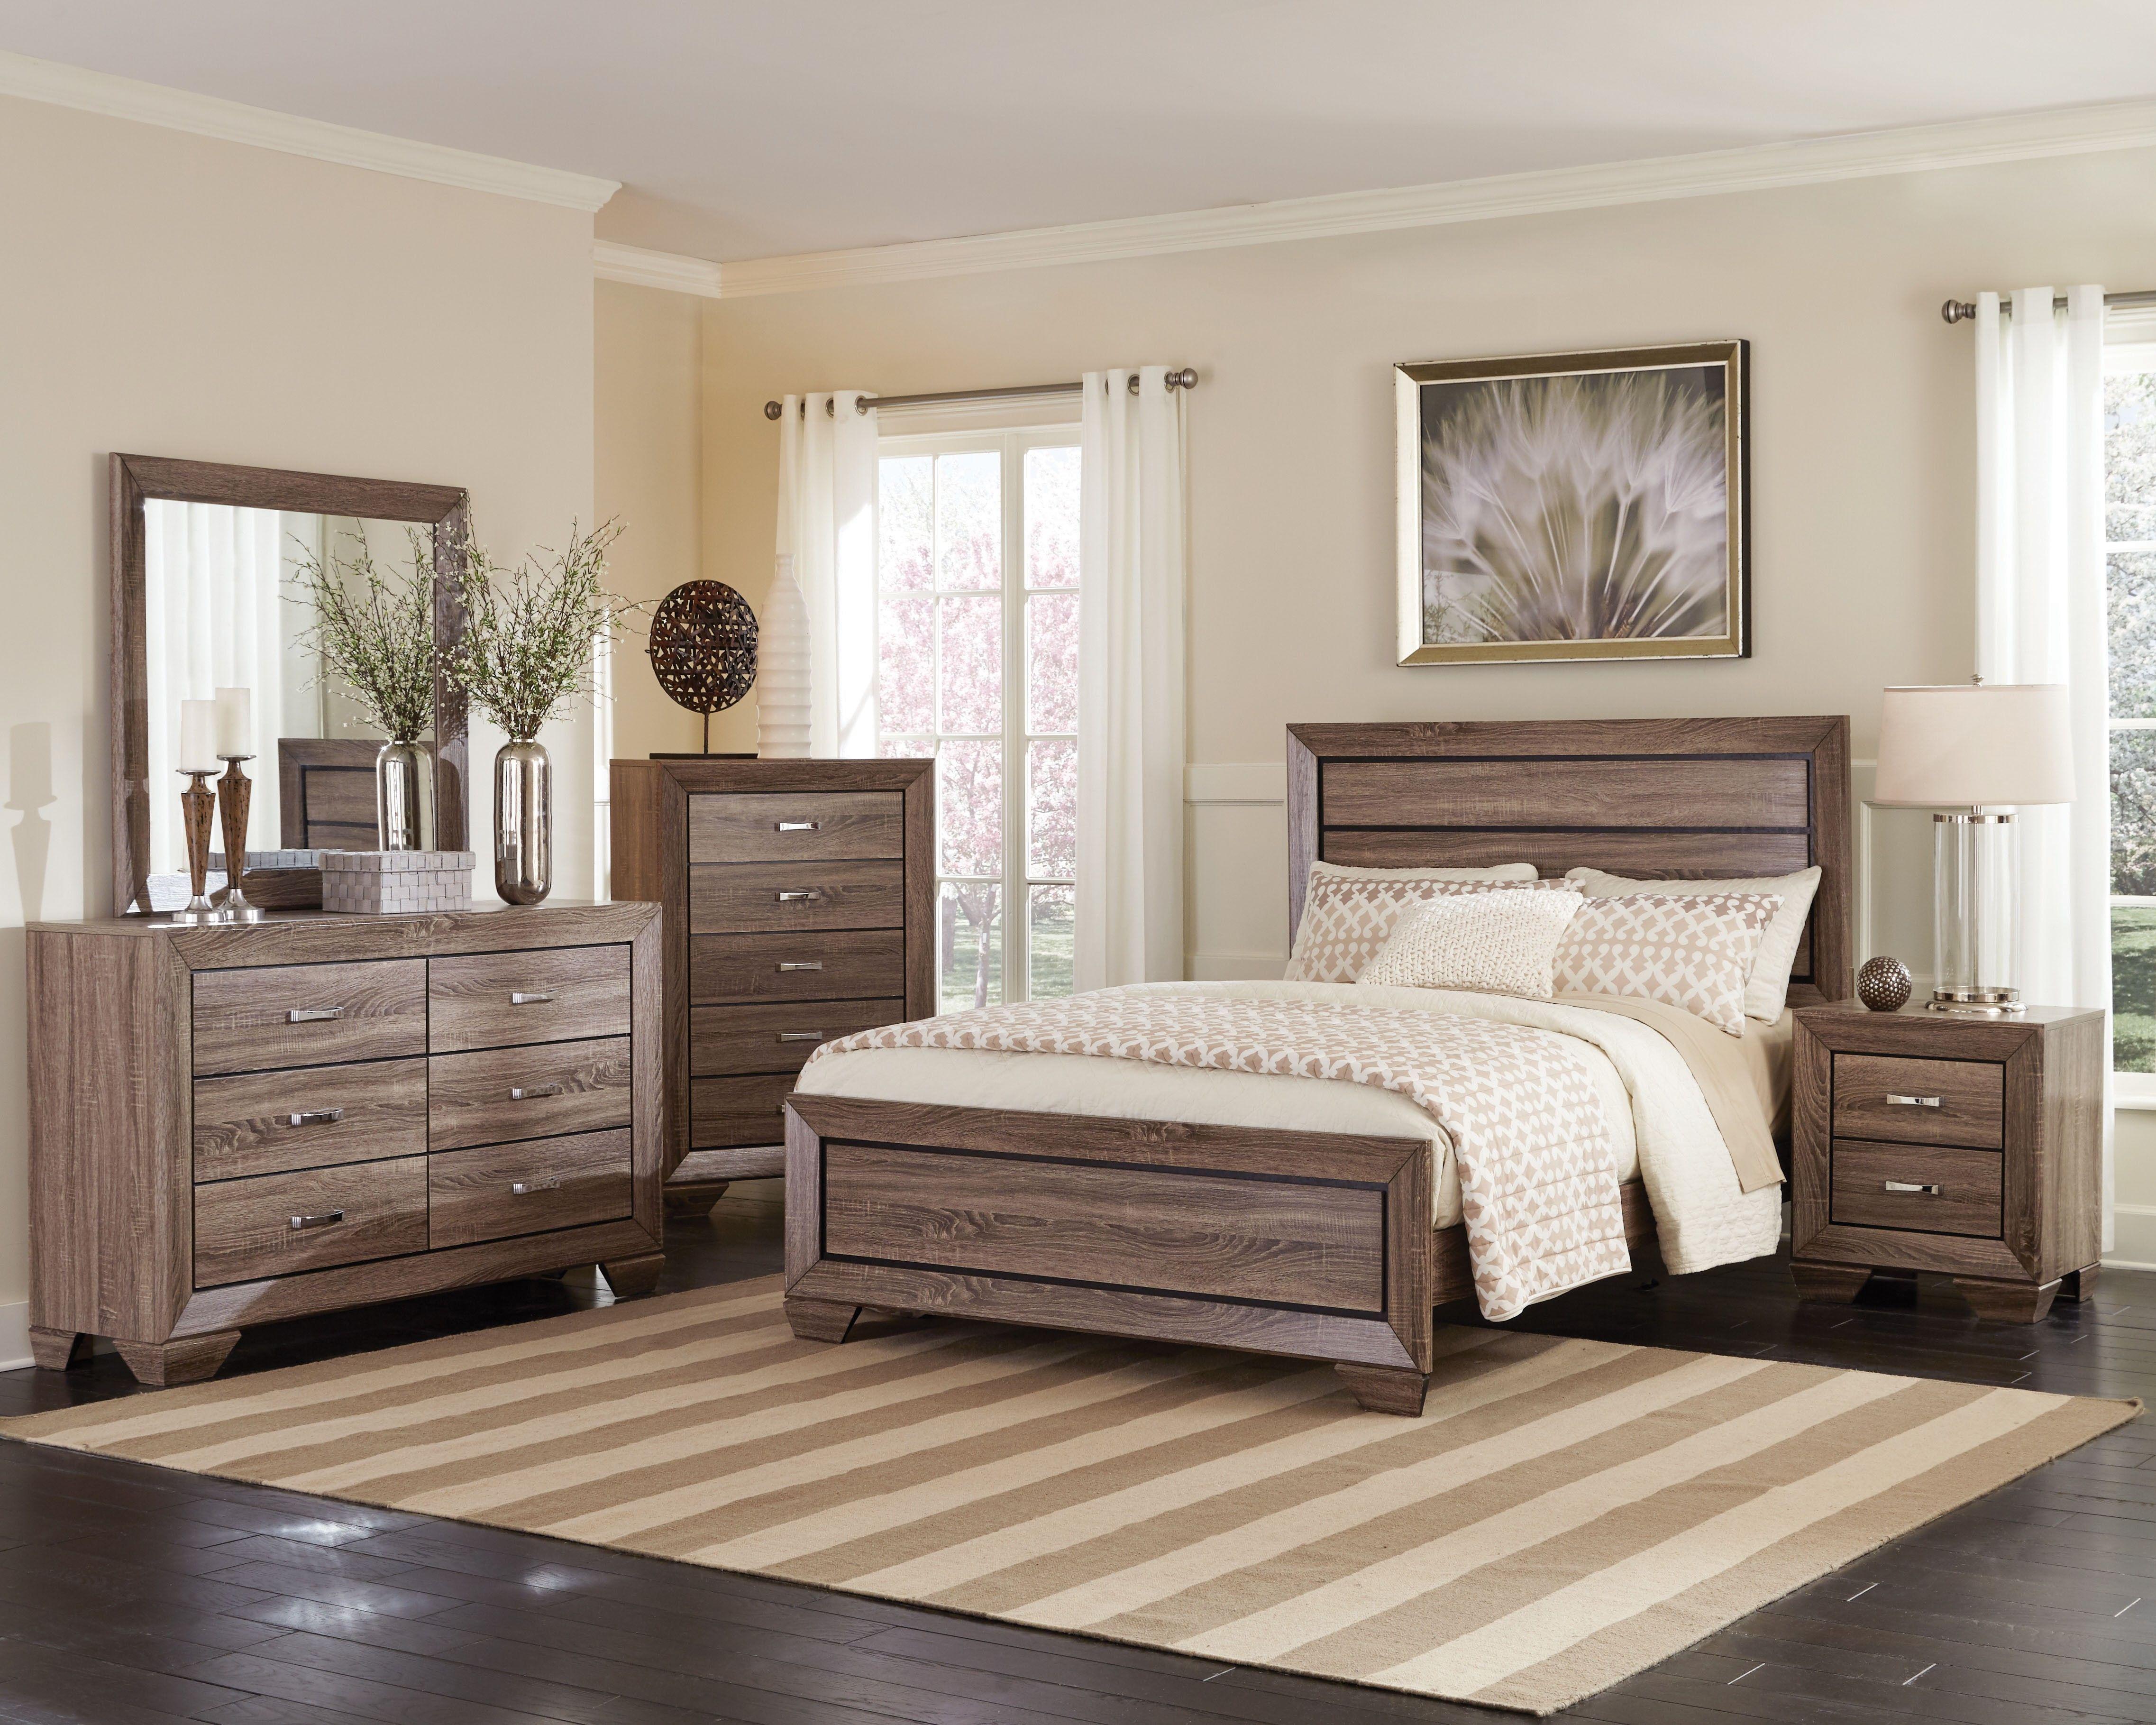 Coaster 204191Kw Kauffman Taupe 4 Pcs California King Bedroom Set Enchanting Cal King Bedroom Sets Inspiration Design